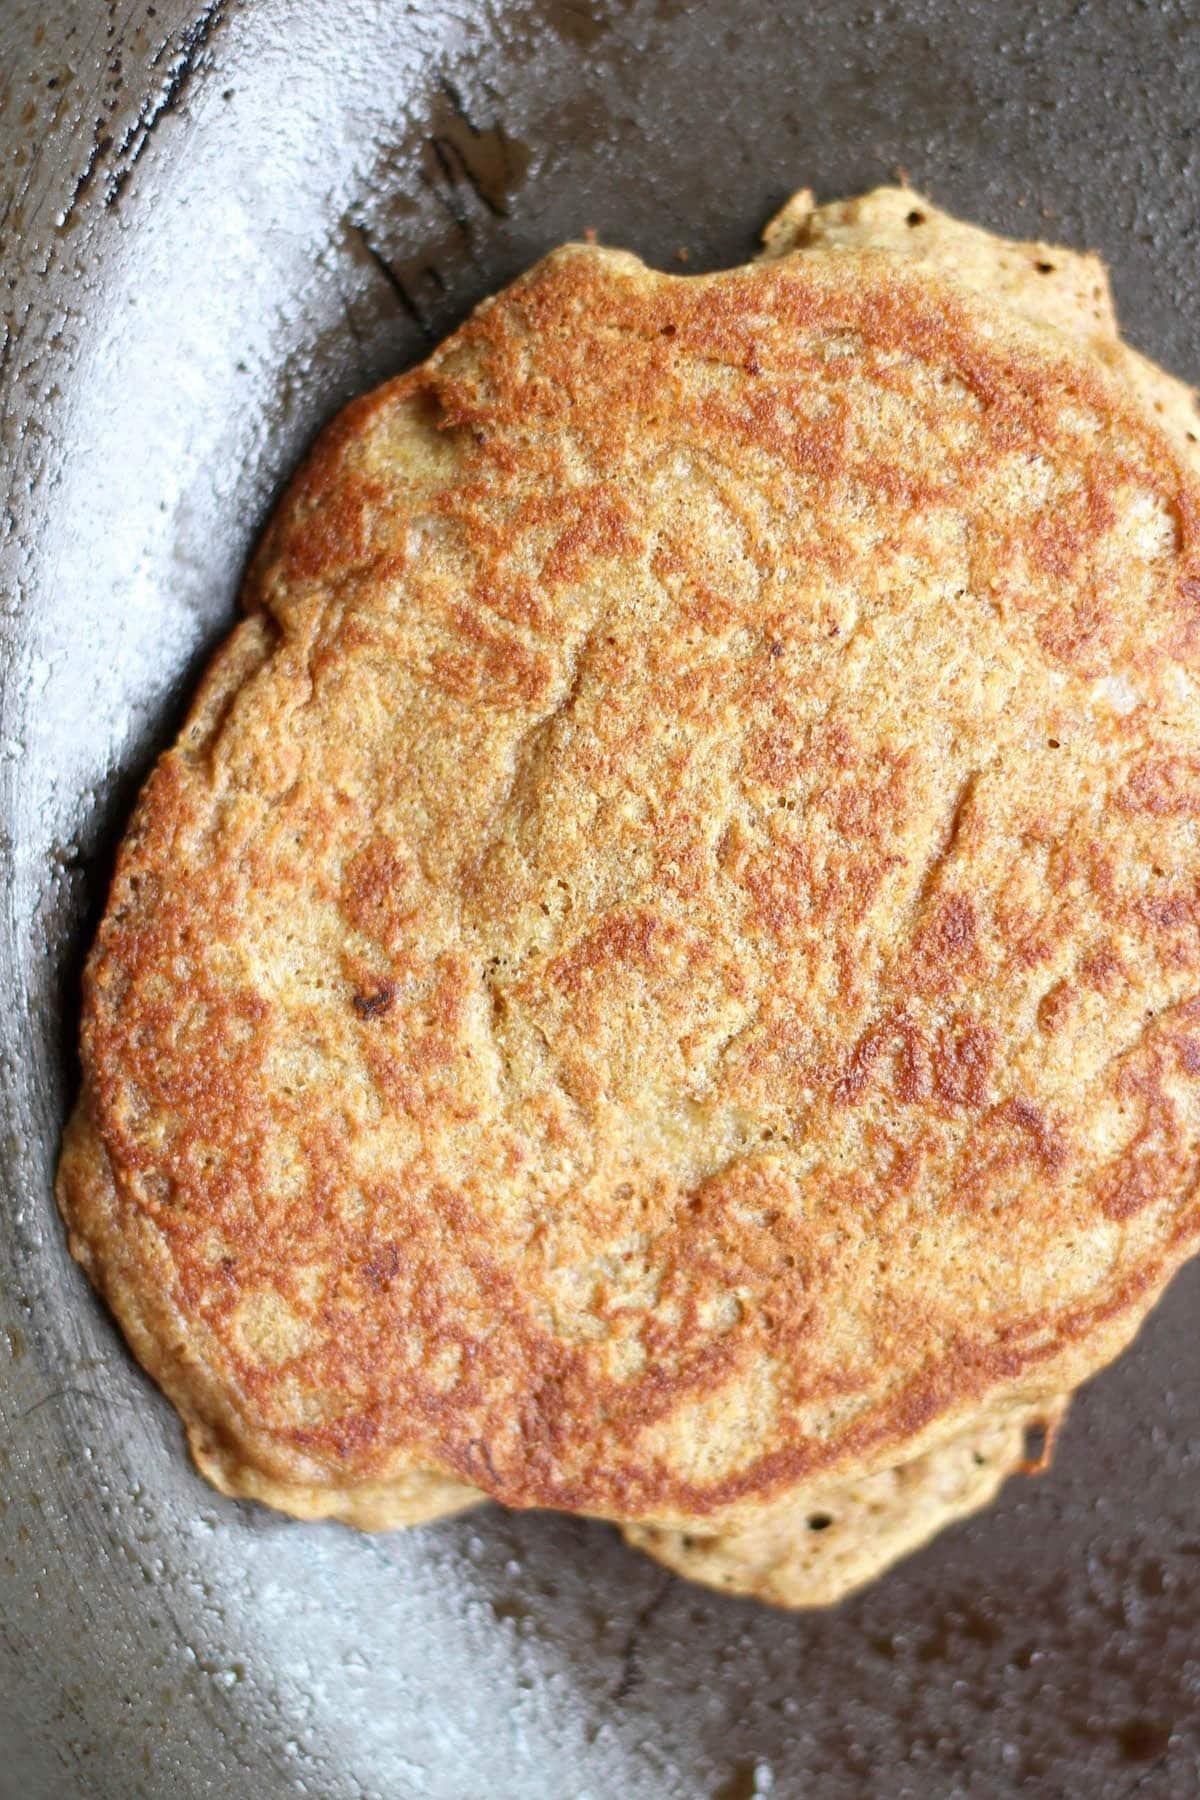 golden brown gluten free pancakes on a pan